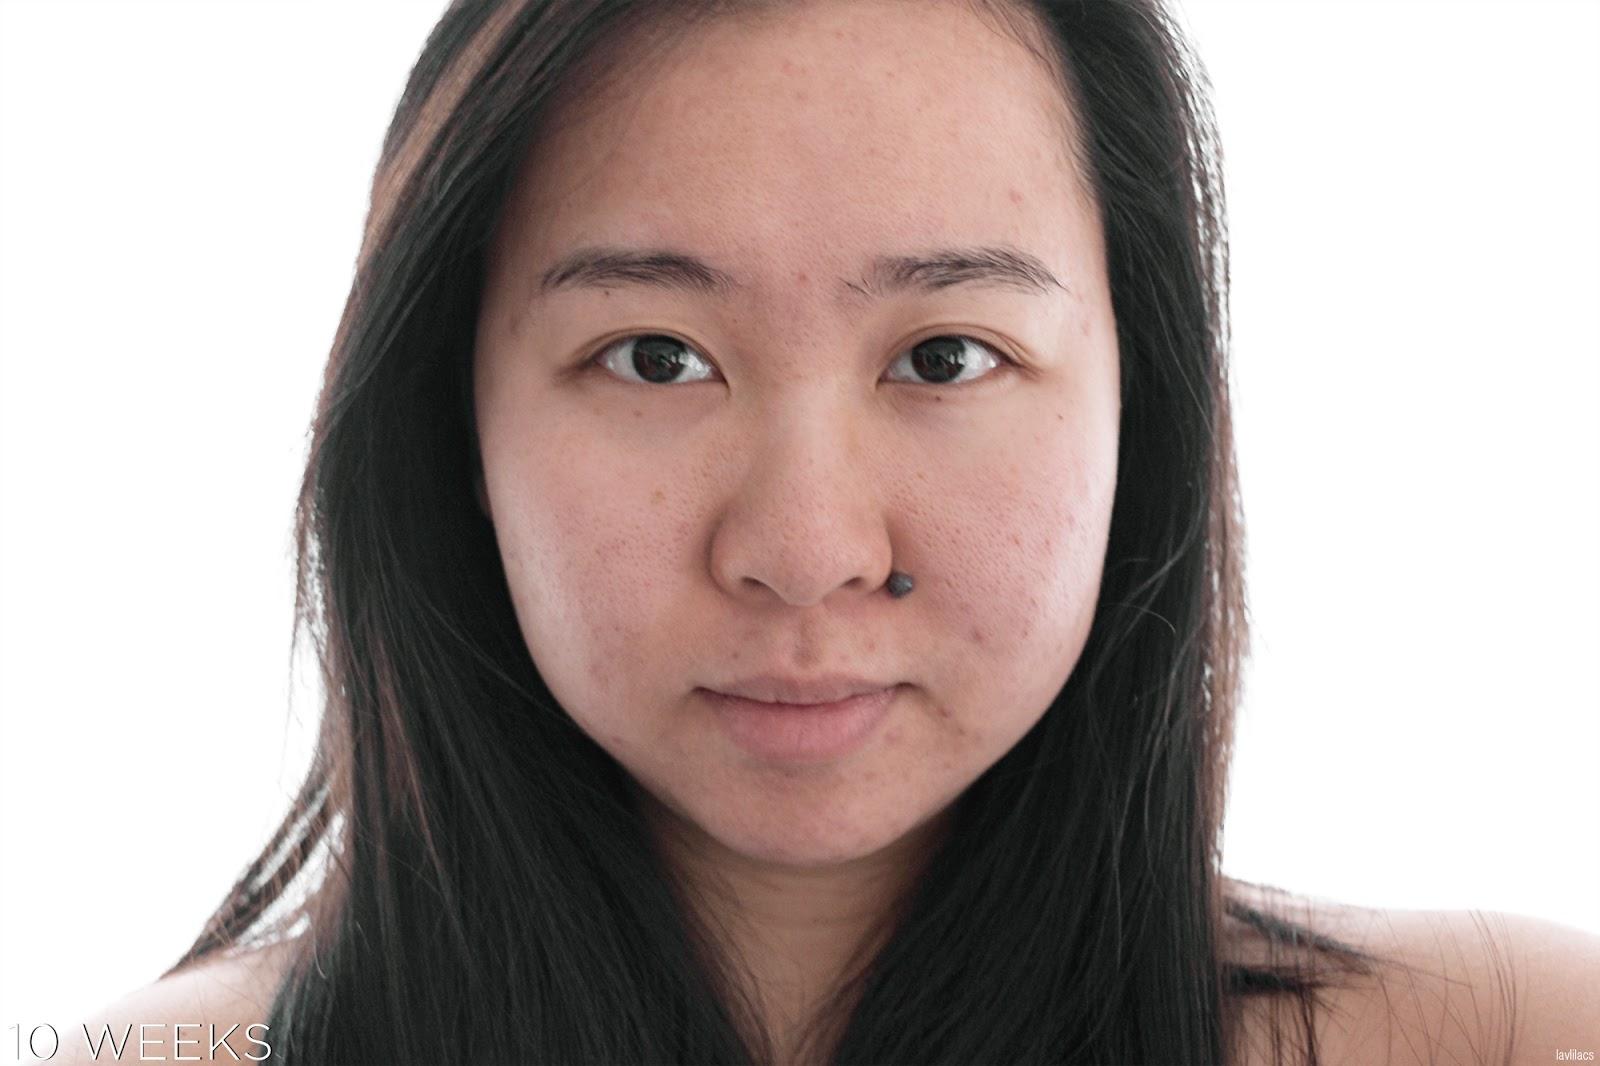 tria Hair Removal Laser Facial Hair 10 Weeks, 2 months